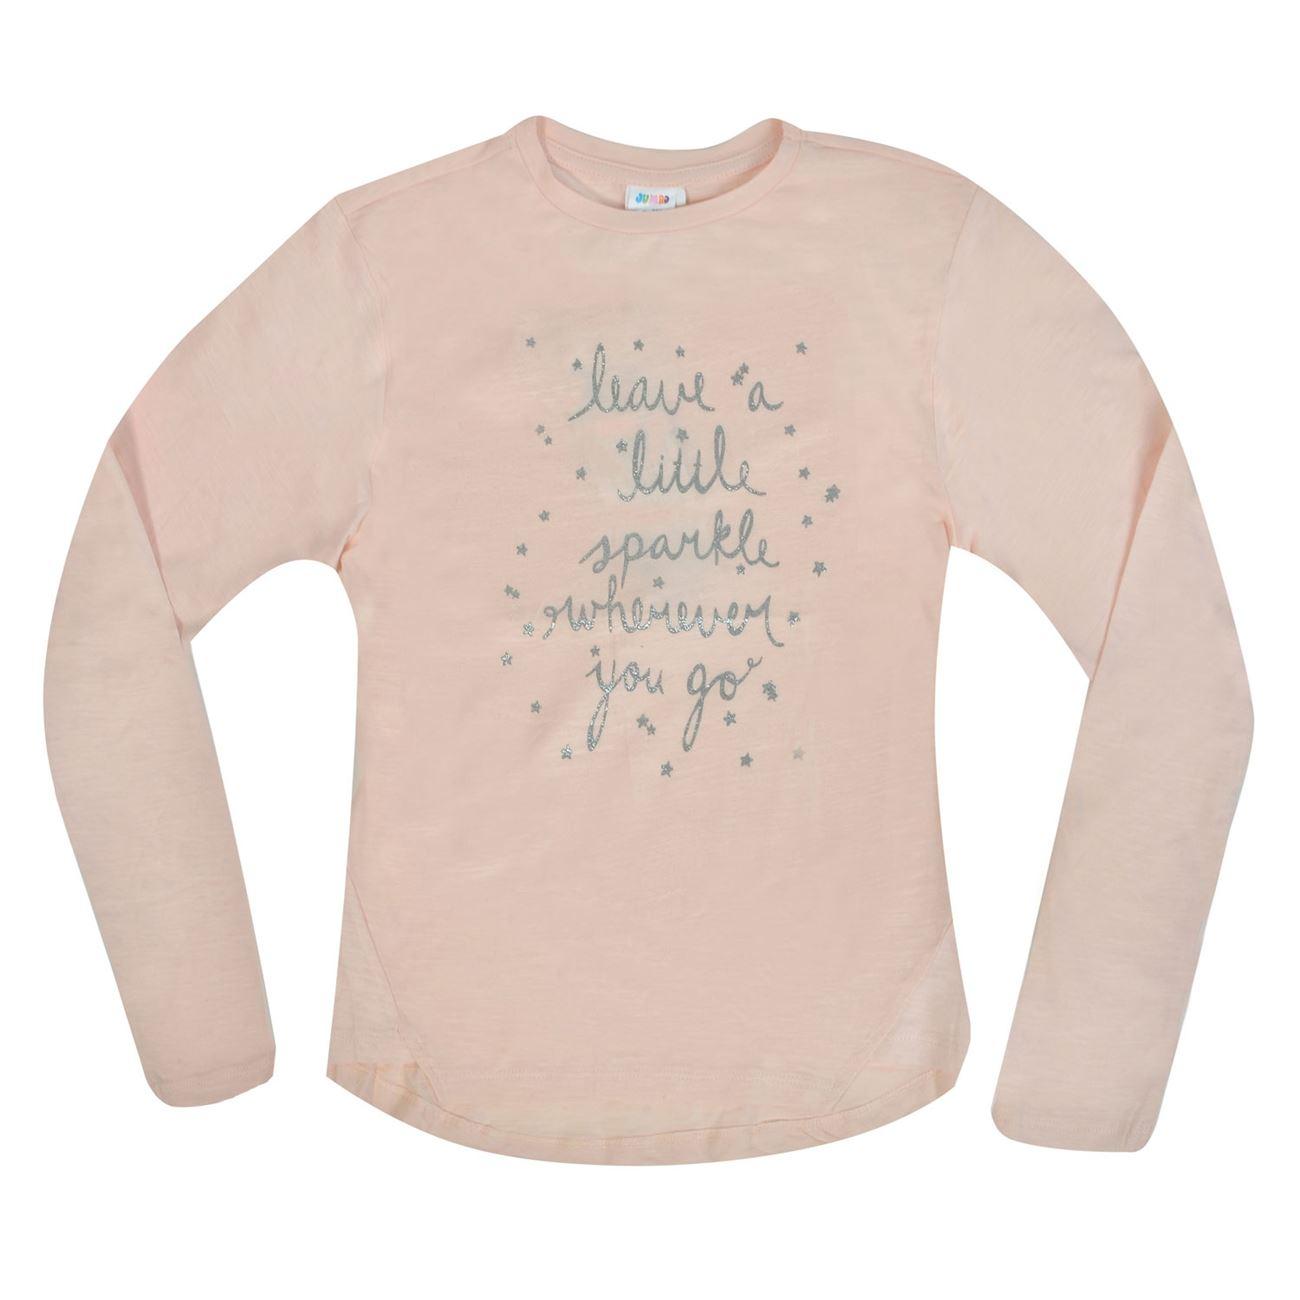 e5f7055a276d Μπλούζα Μακρυμάνικη Παιδική Κοραλλί Ασημί Glitter Τύπωμα ...